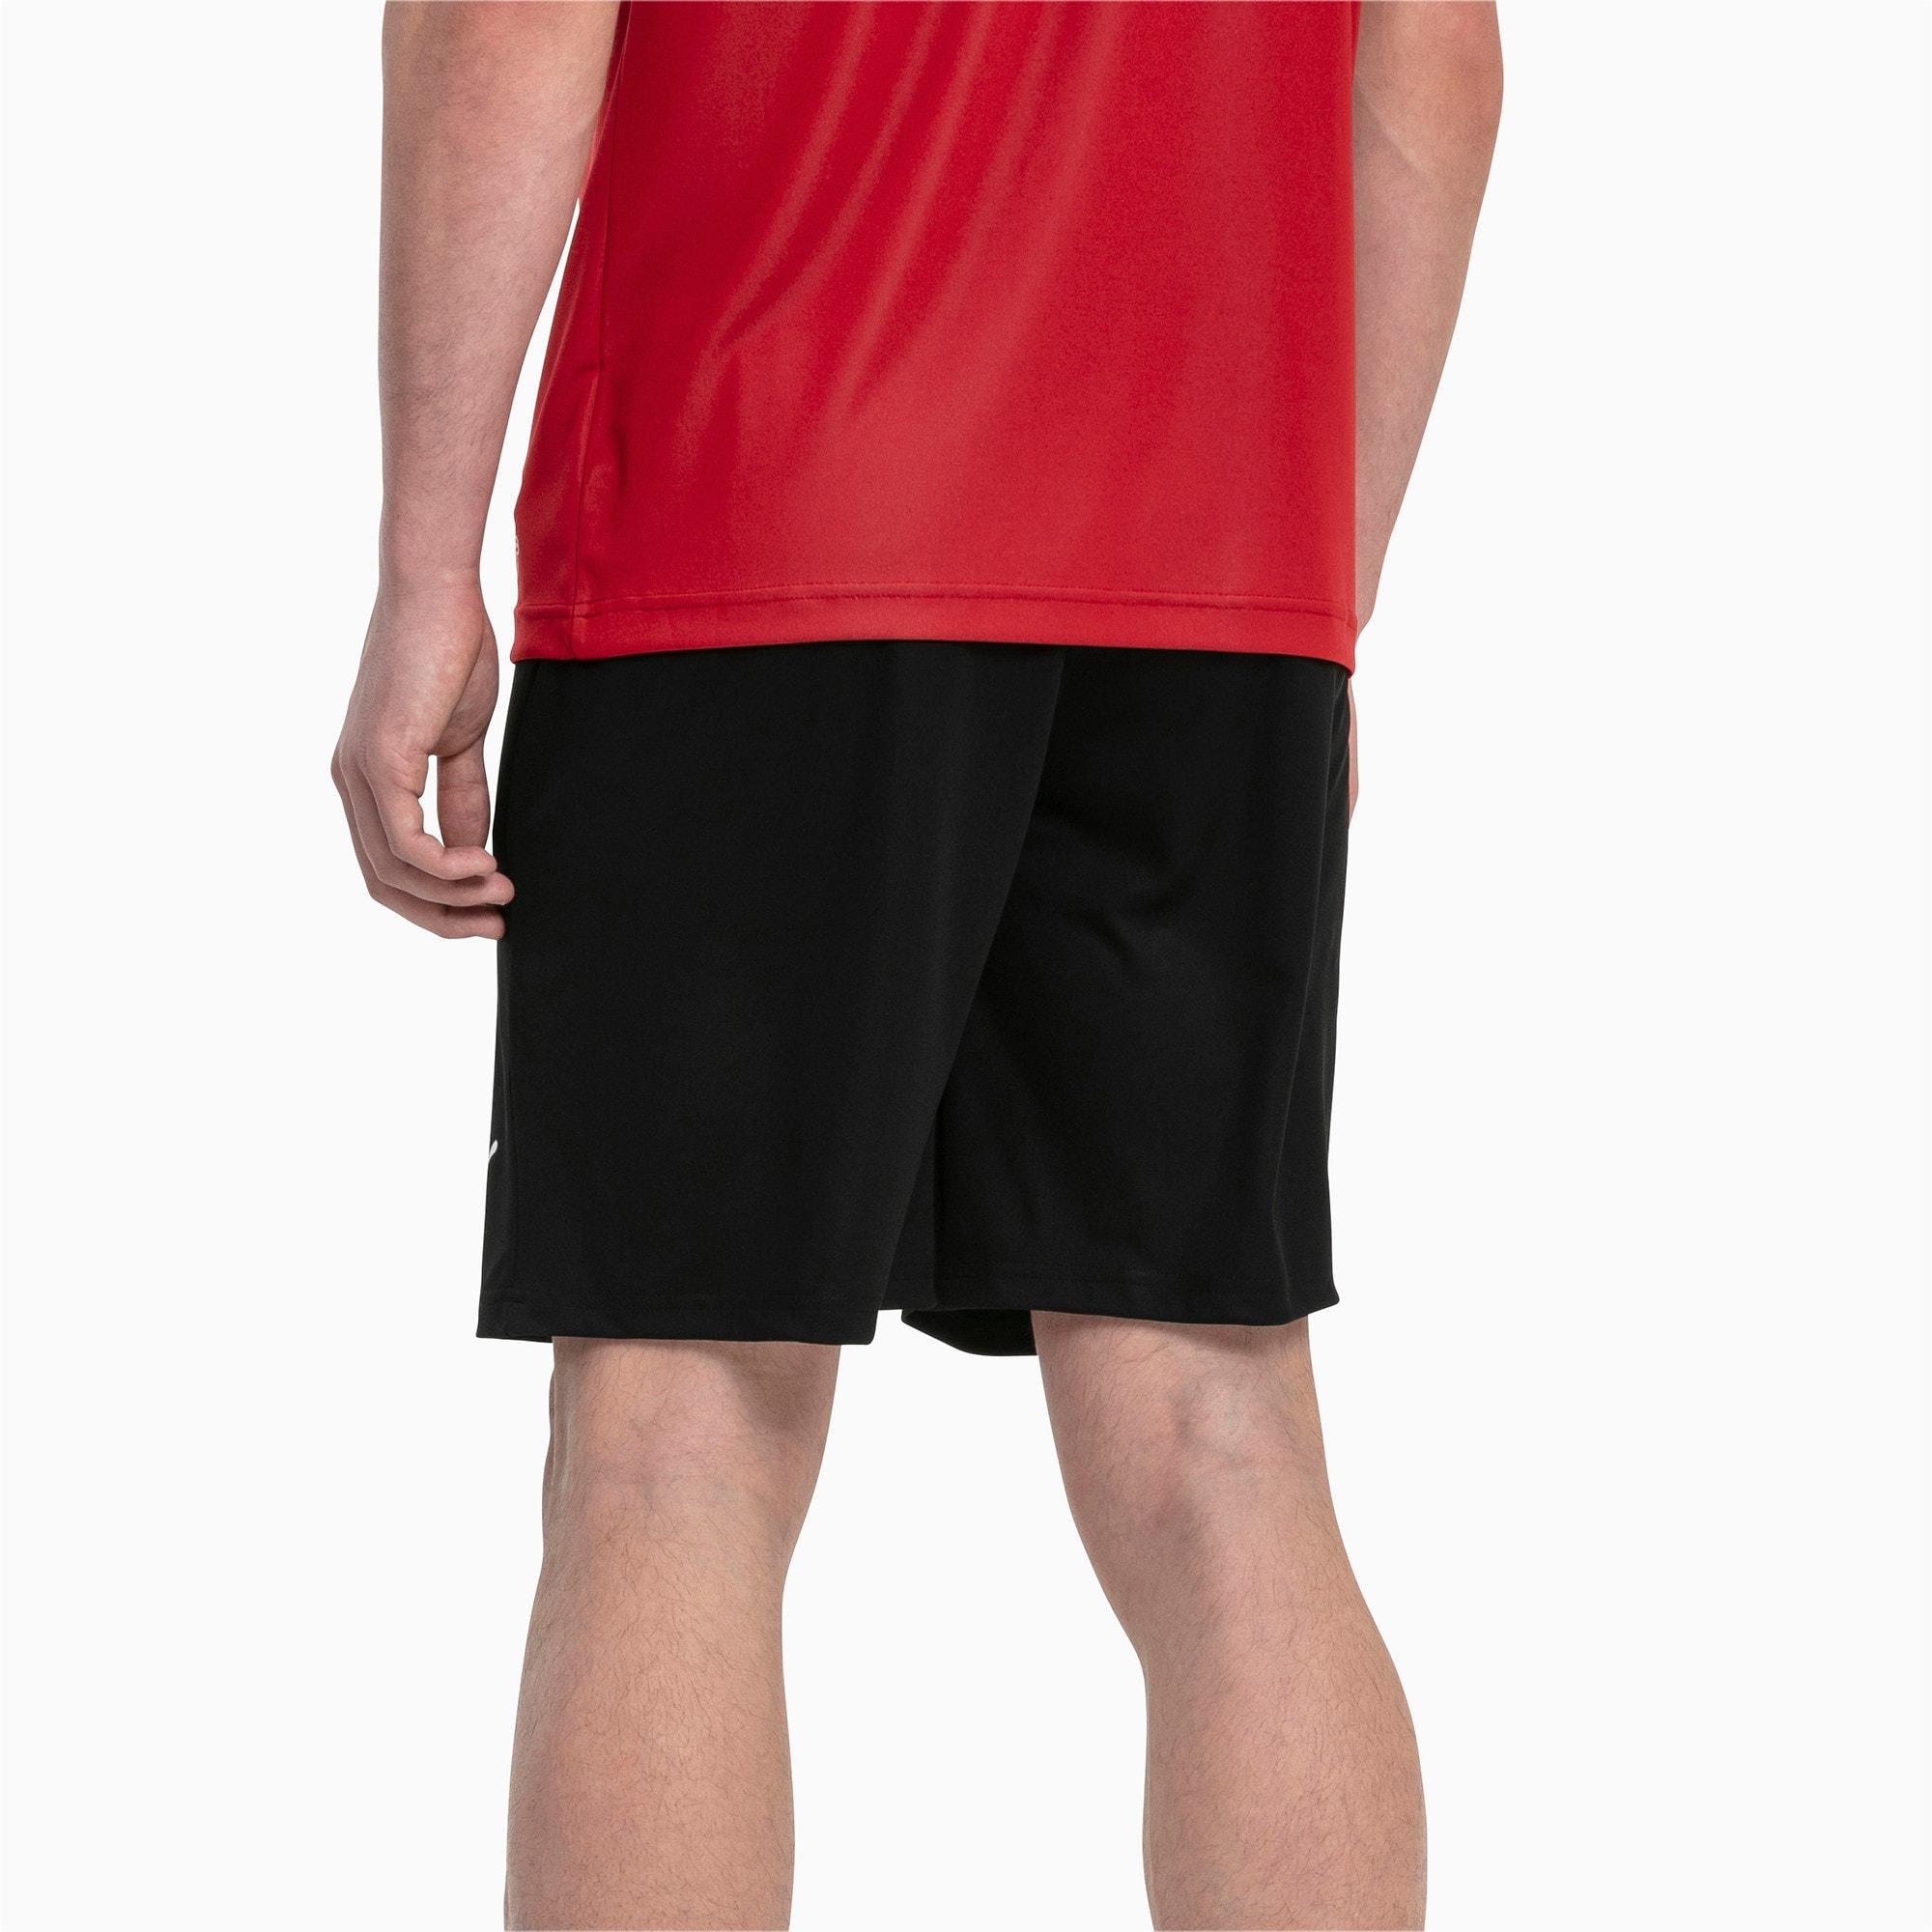 Thumbnail 2 of Liga Core Men's Shorts, Puma Black-Puma White, medium